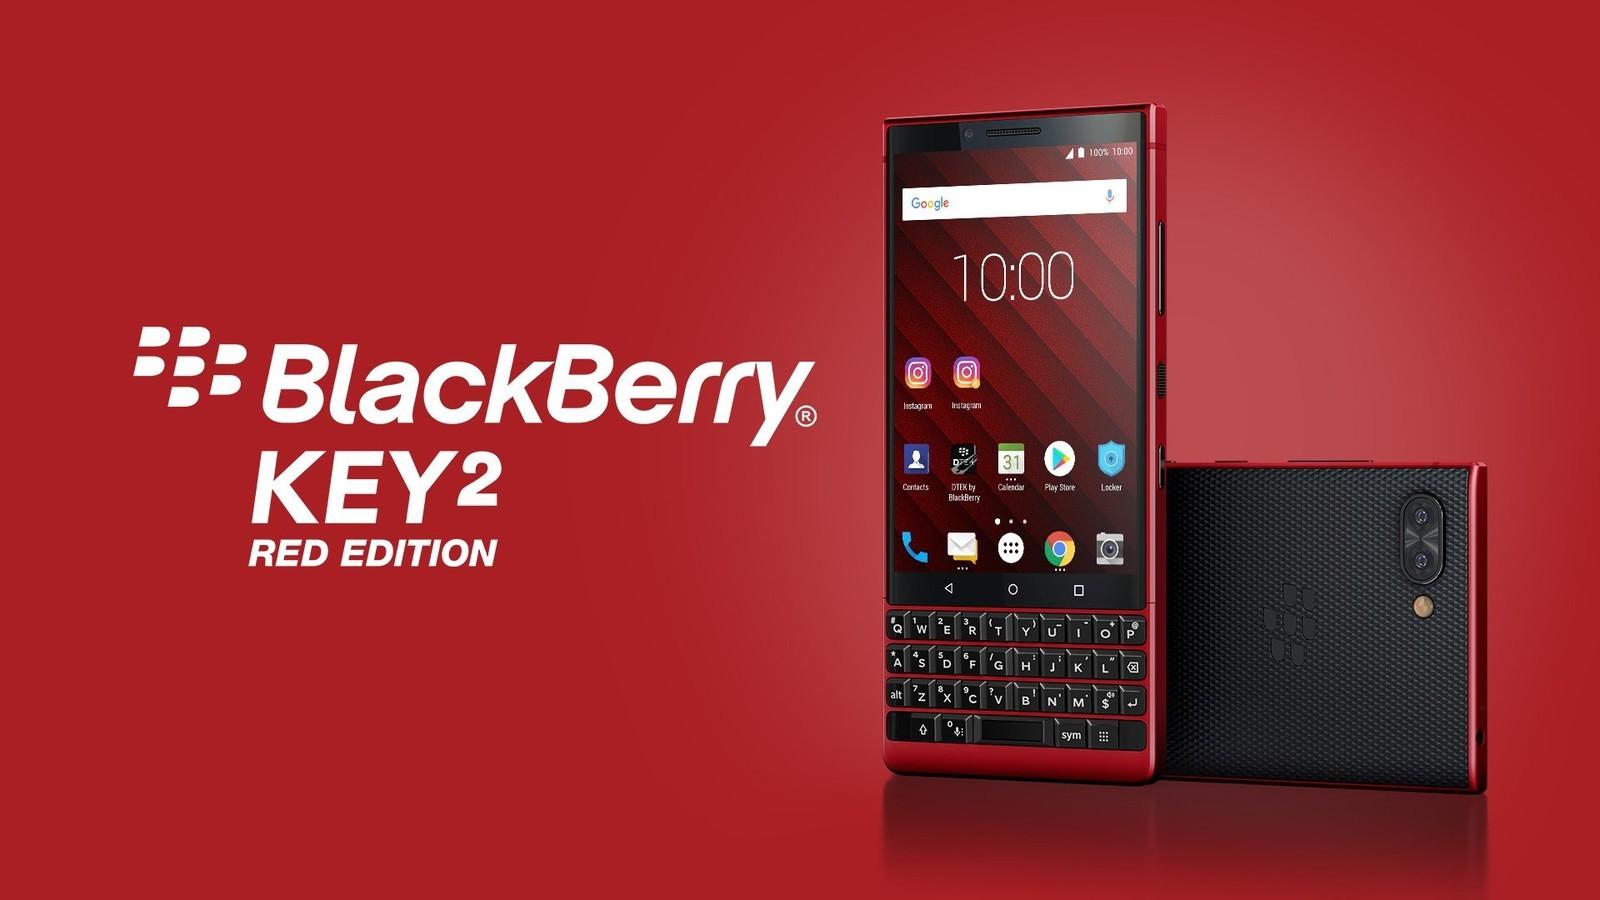 Картинки по запросу BlackBerry KEY2 Red Edition